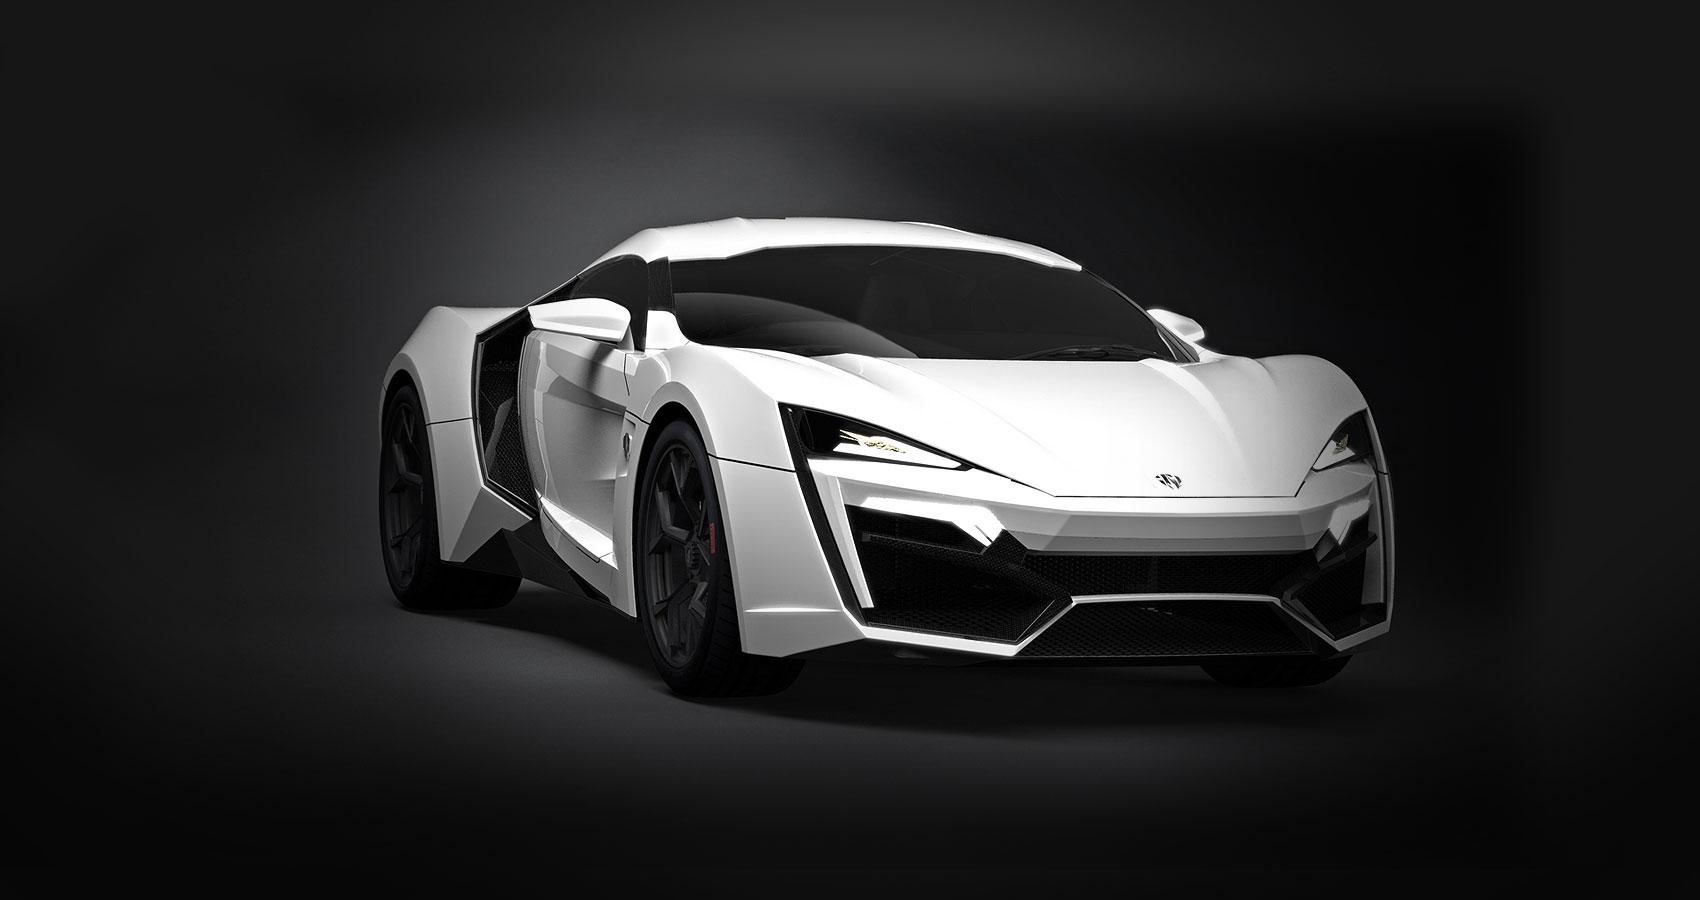 Imagem de Lykan Hypersport: tudo sobre o carro alucinante de Velozes e Furiosos 7 no tecmundo